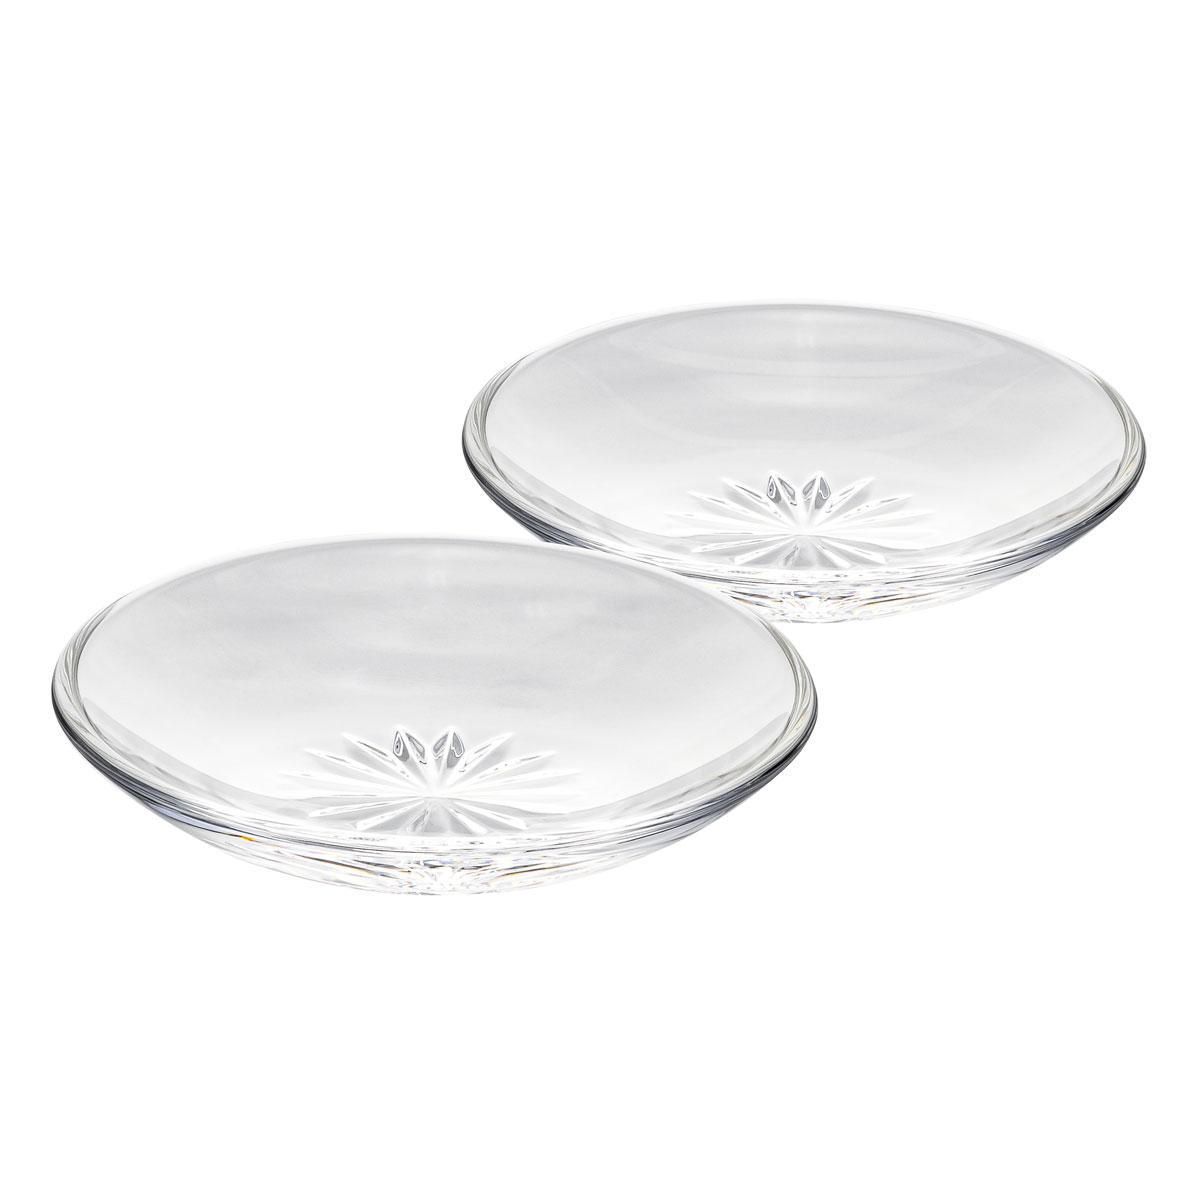 Waterford Crystal Connoisseur Tasting Cap Pair